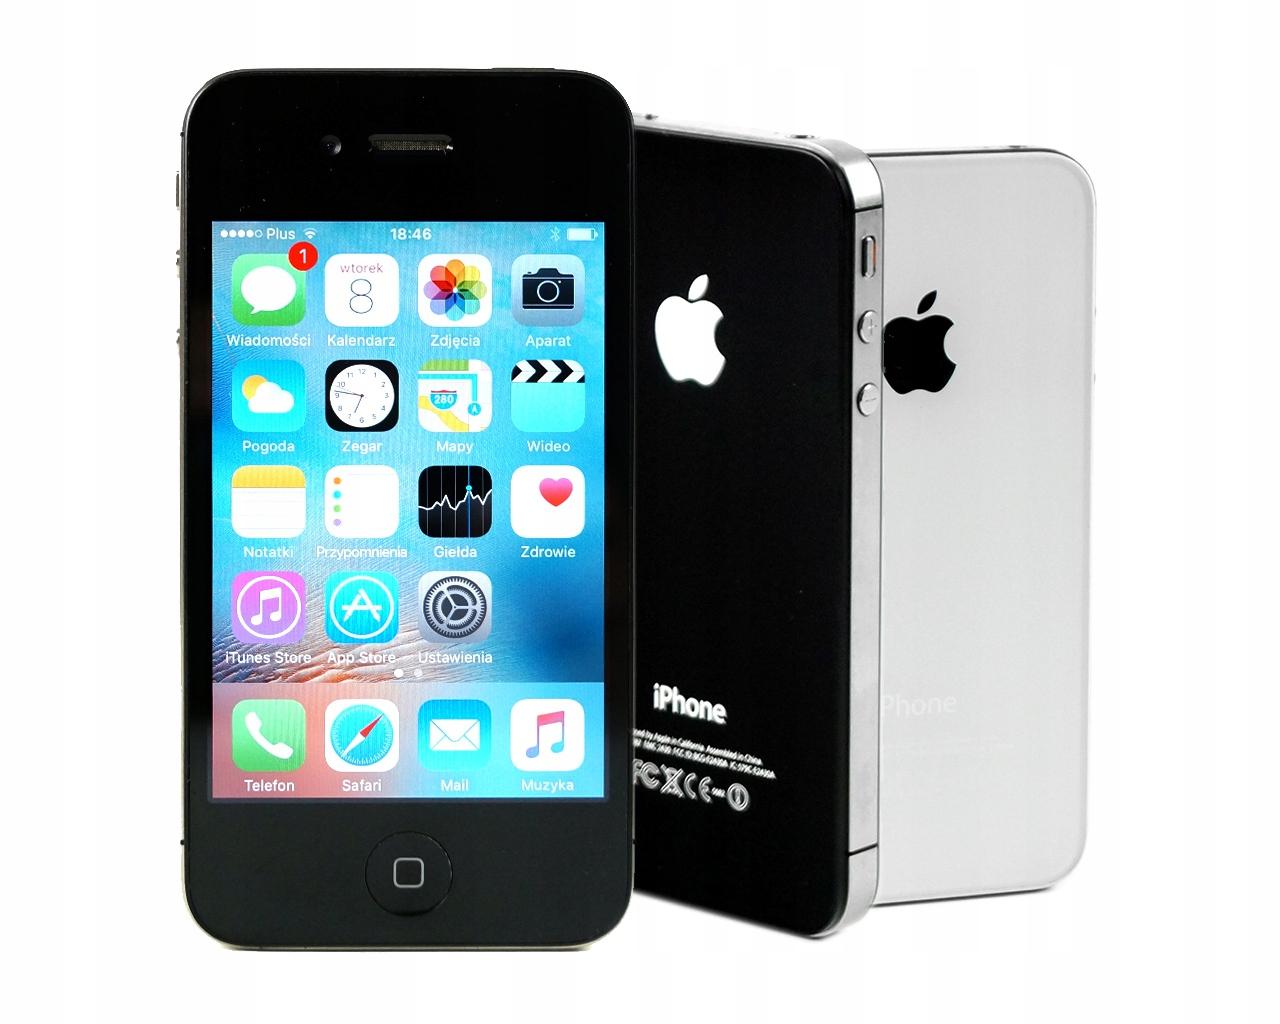 Okazja Iphone 4s Black 16gb Blokada Icloud